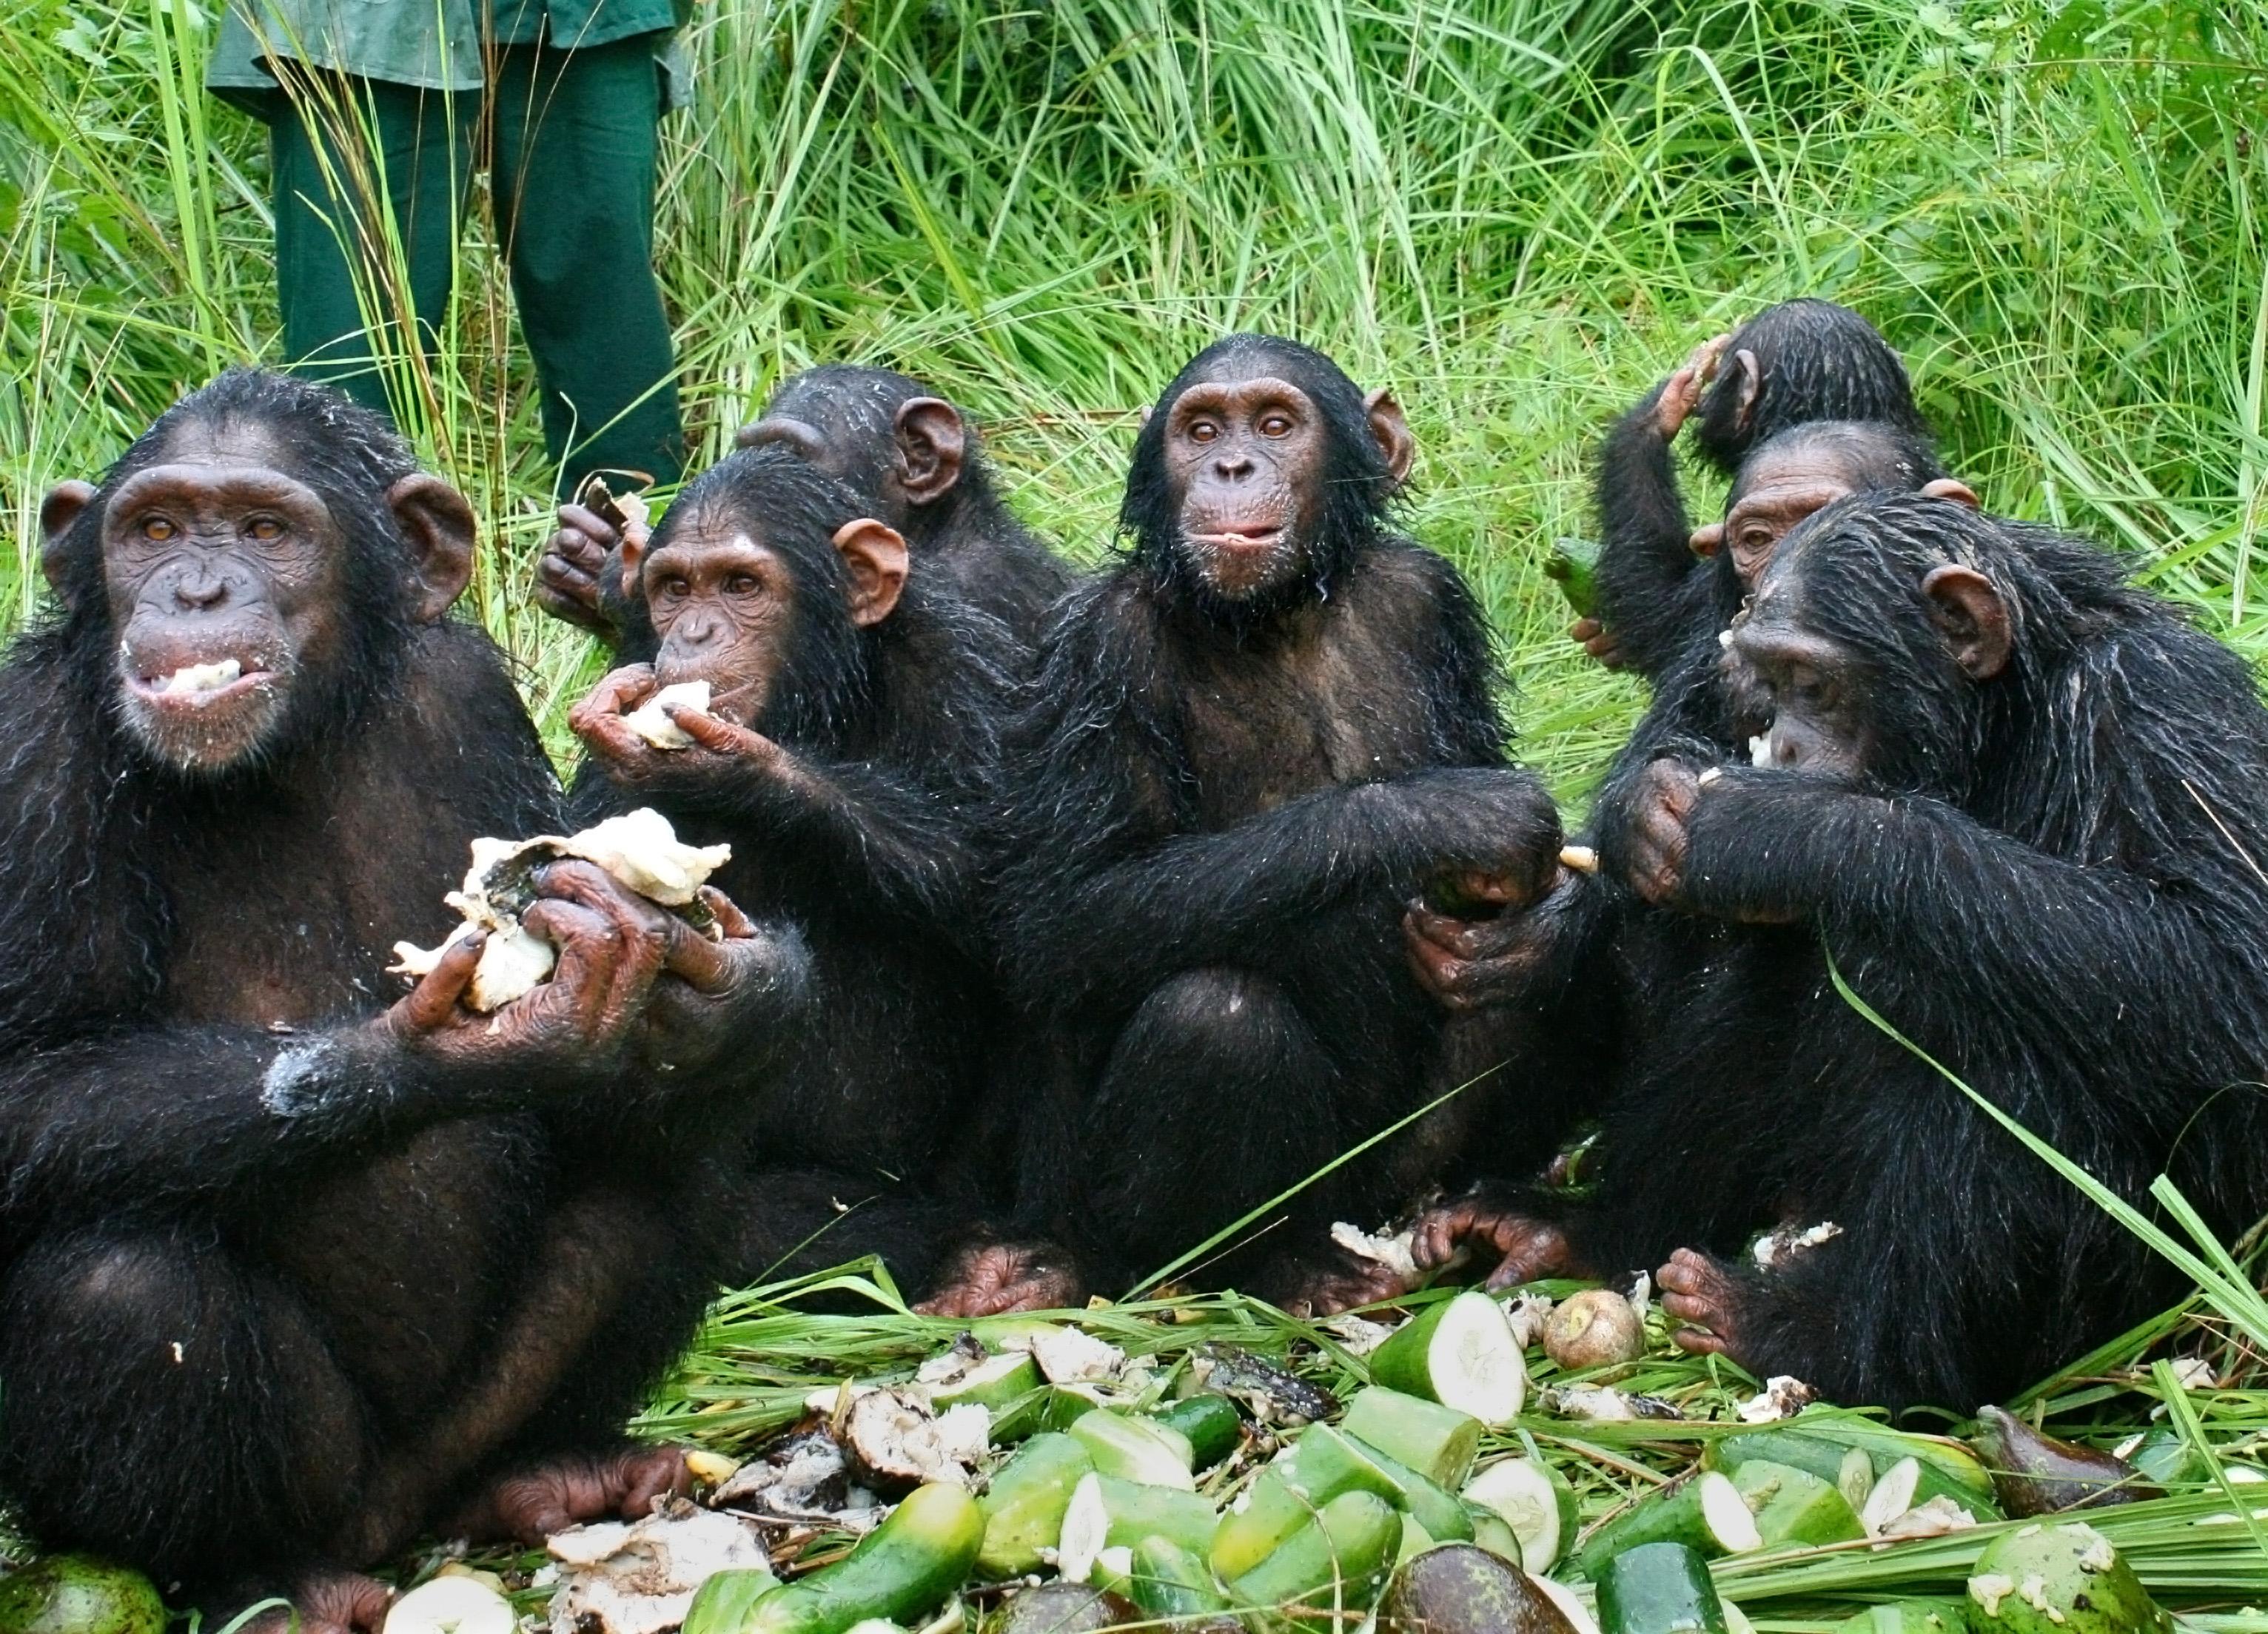 File photo: Chimpanzees